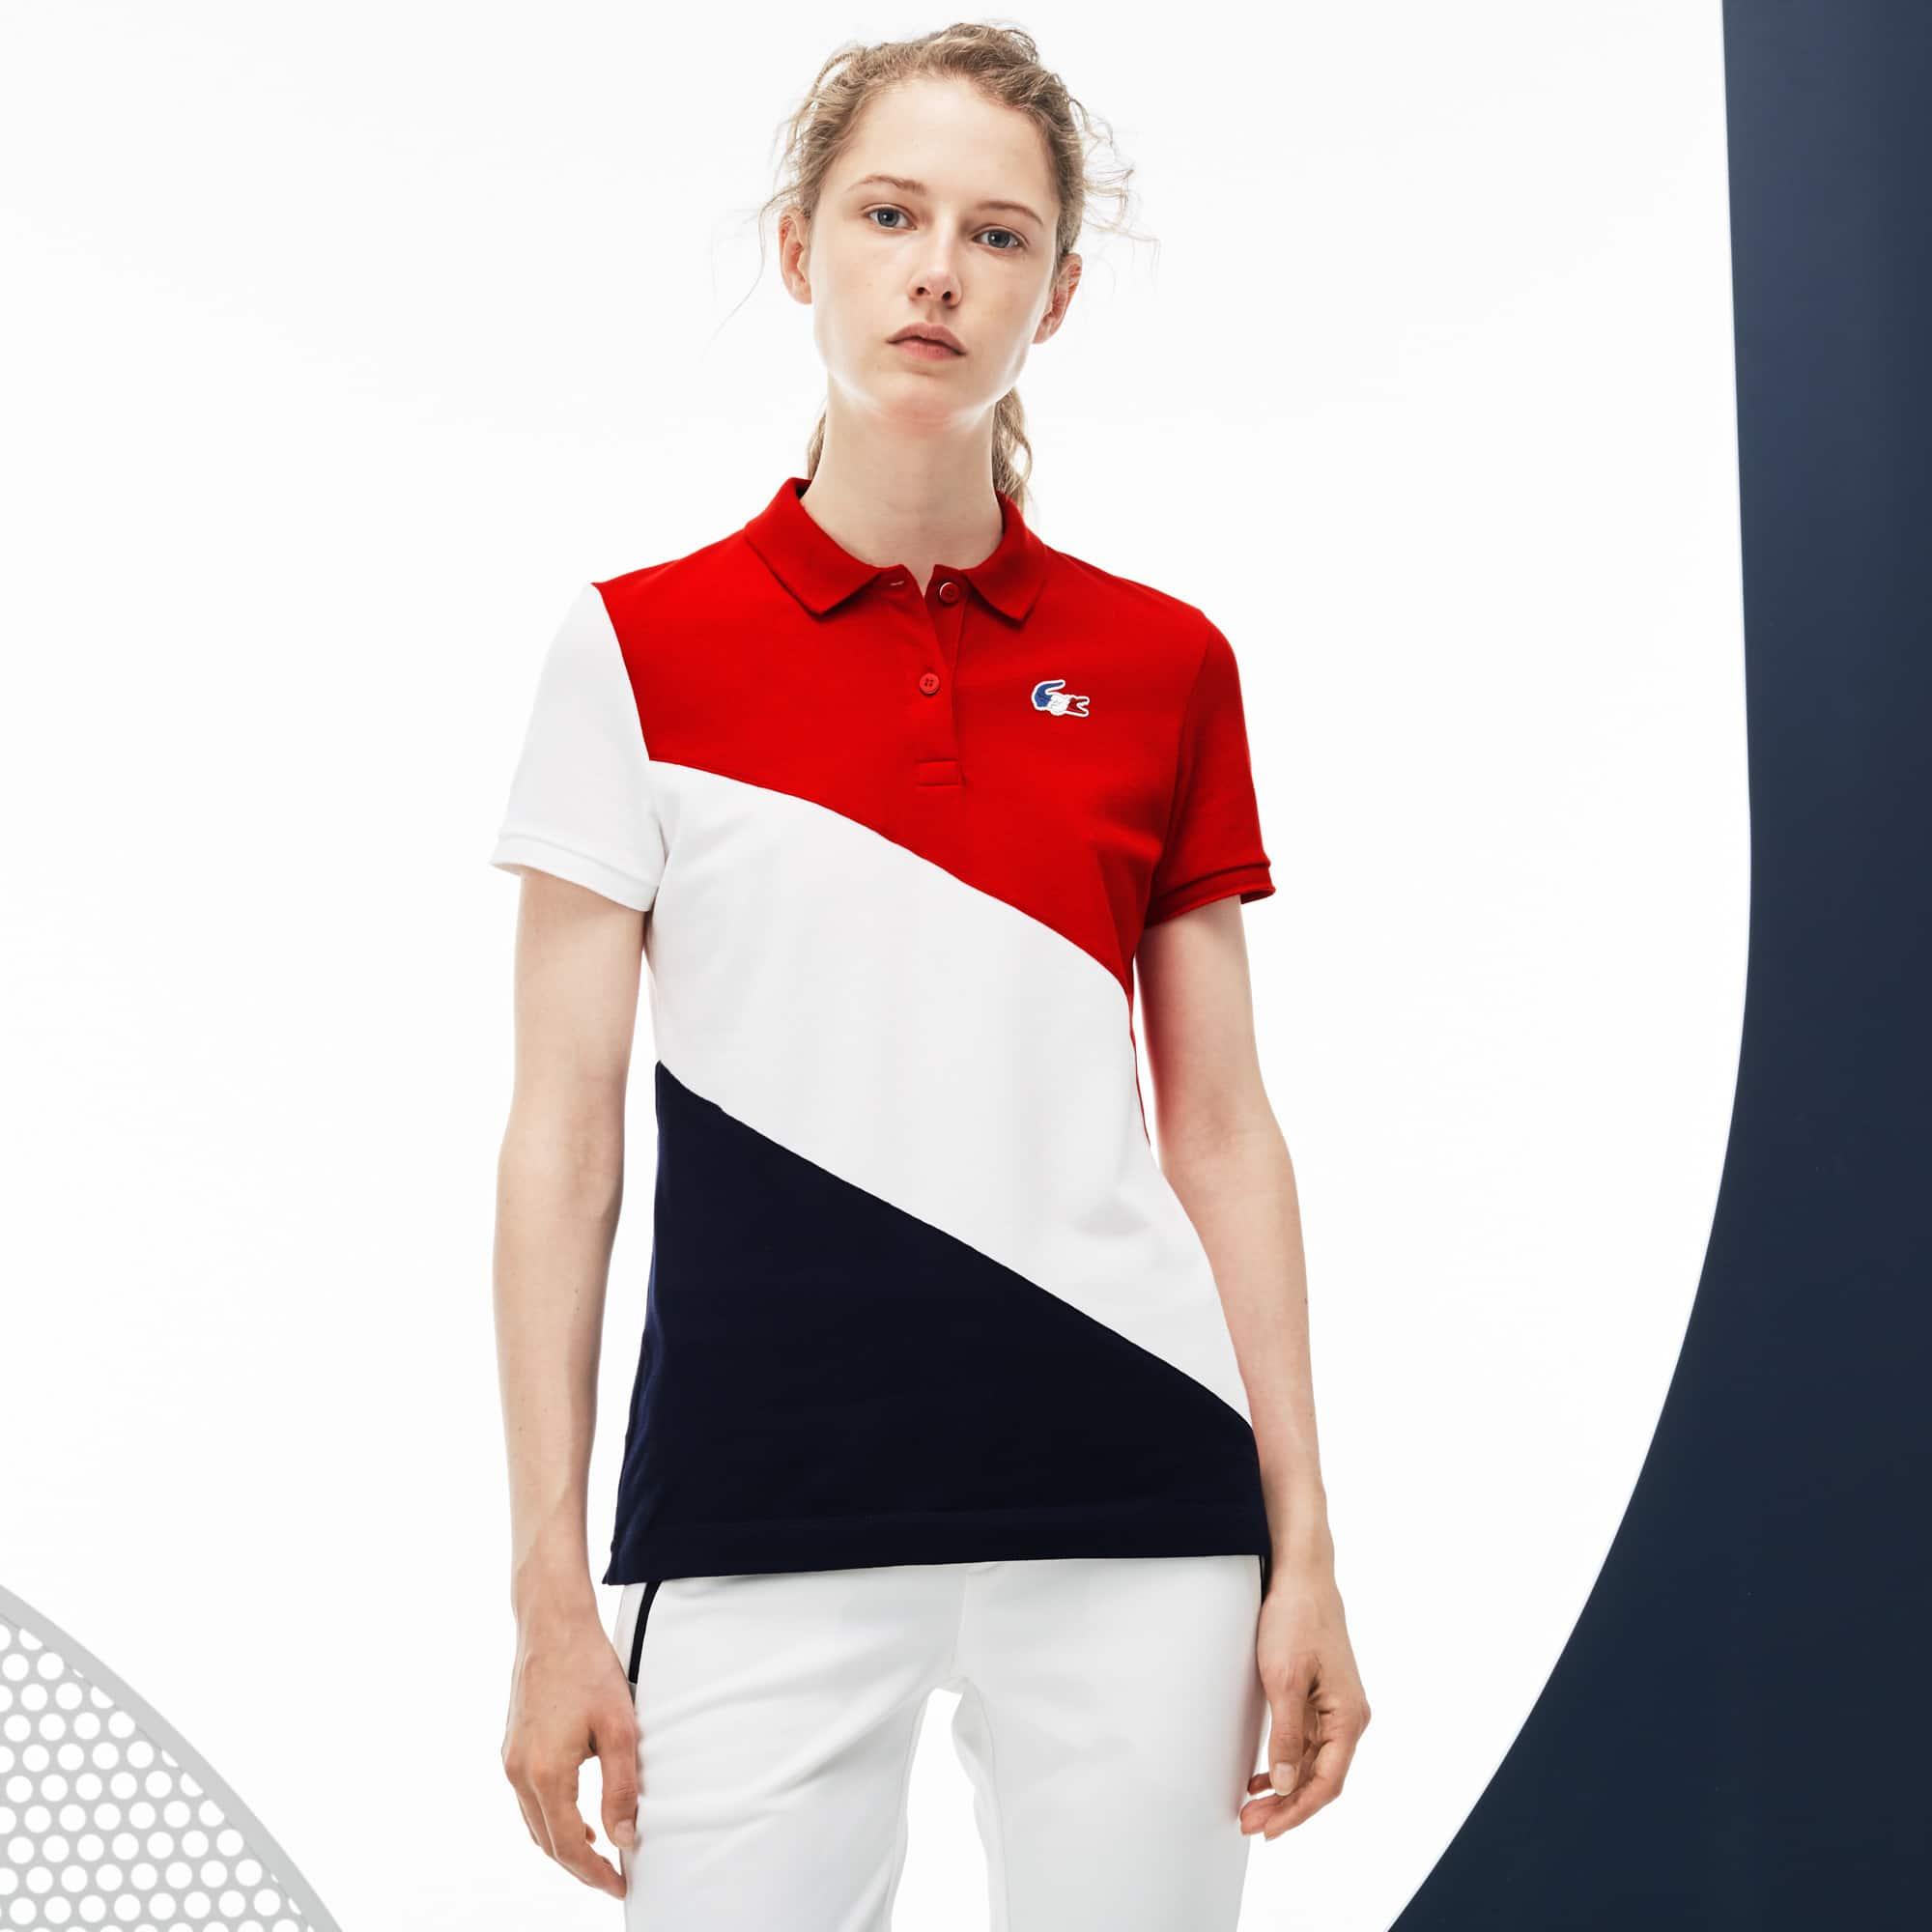 Women's Lacoste FRENCH SPORTING SPIRIT Edition Colorblock Mini Piqué Polo